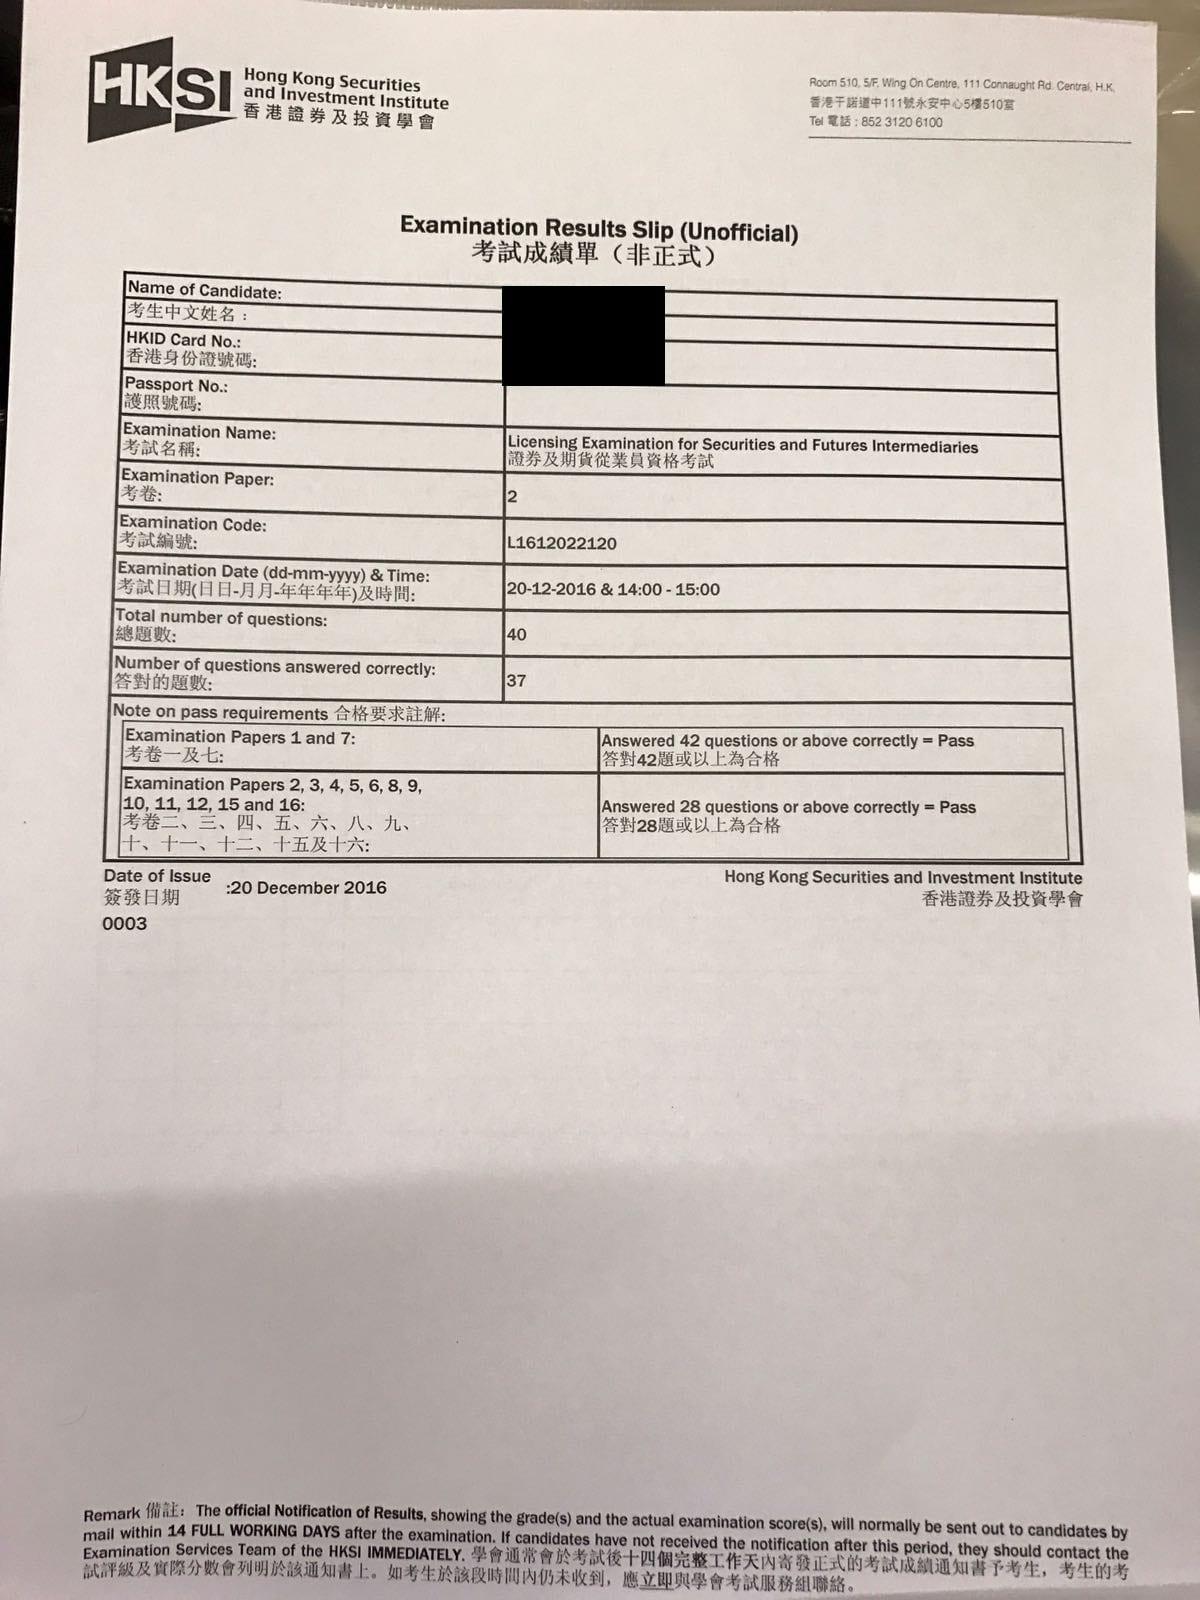 WKF 20/12/2016 LE Paper 2 證券期貨從業員資格考試卷二 Pass